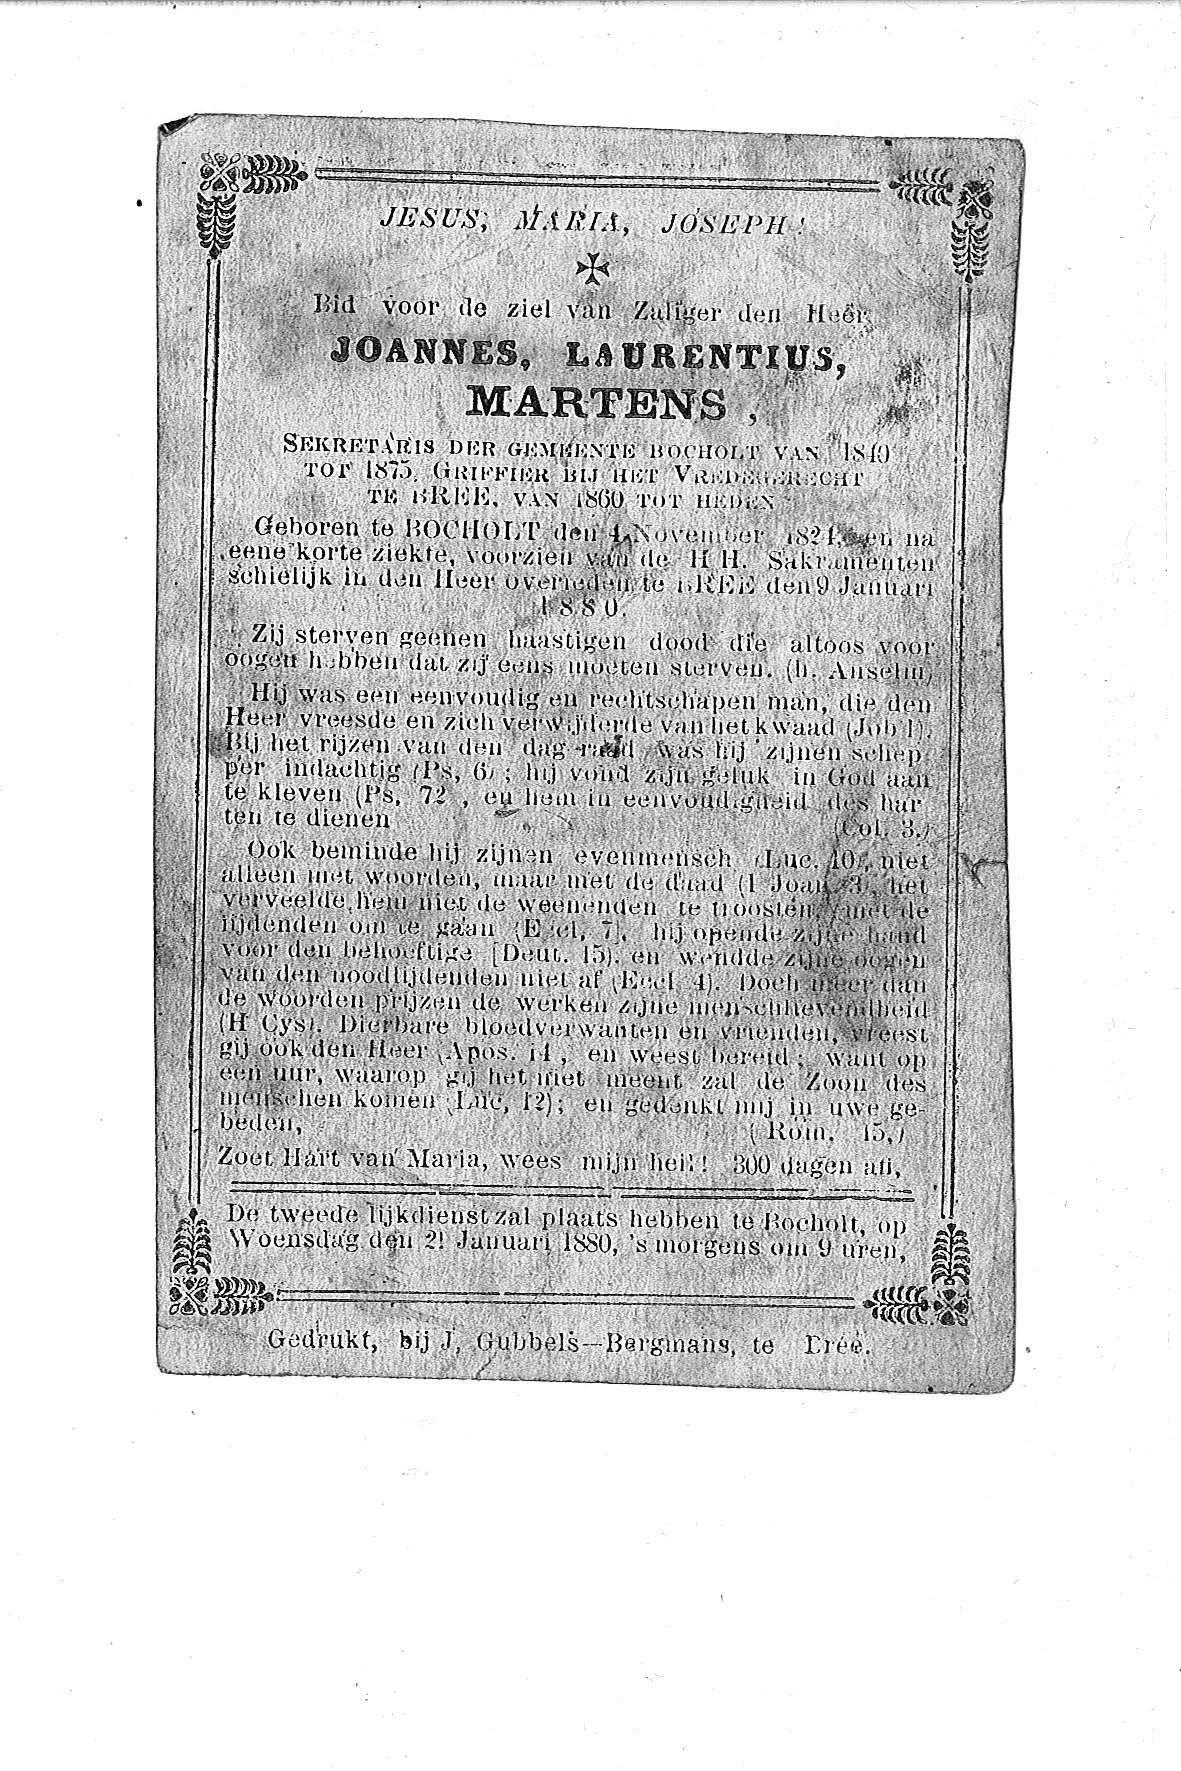 Joannes-Laurentius(1860)20100128144930_00011.jpg